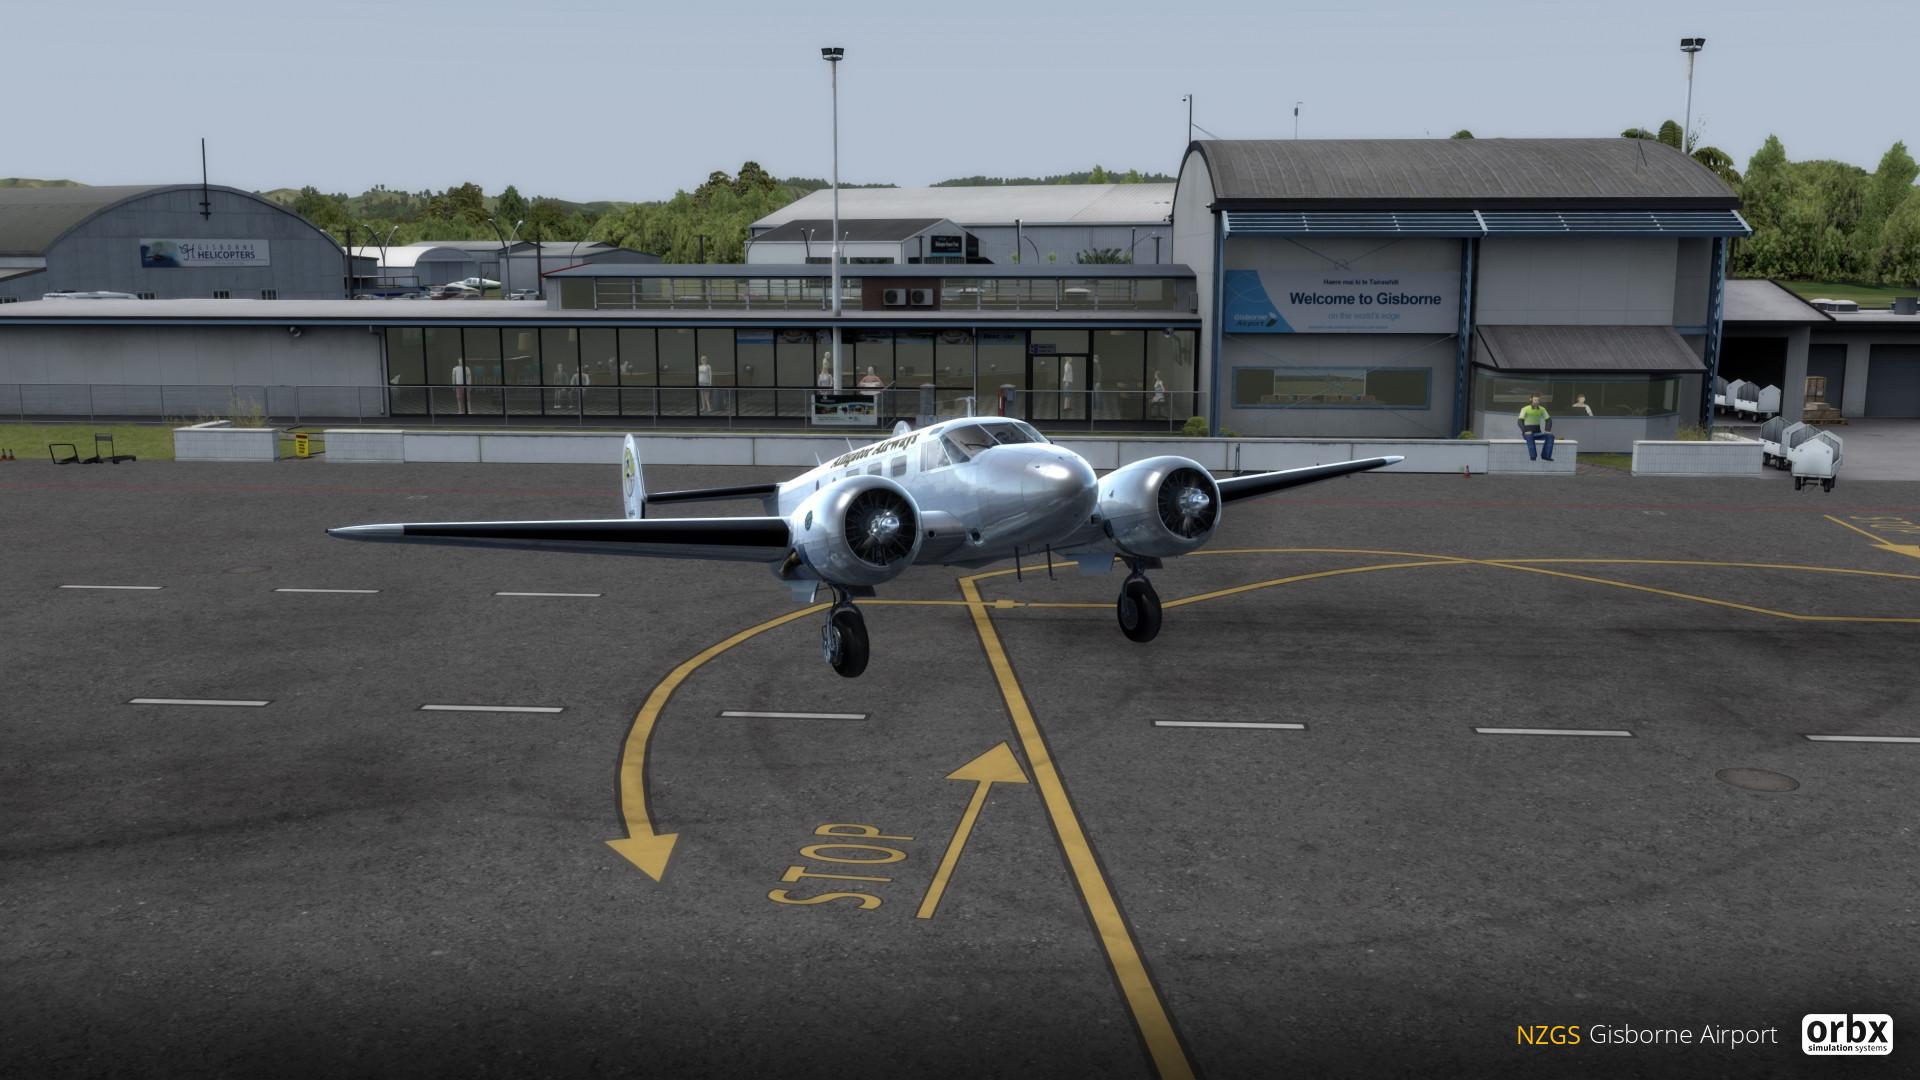 NZGS Gisborne Airport